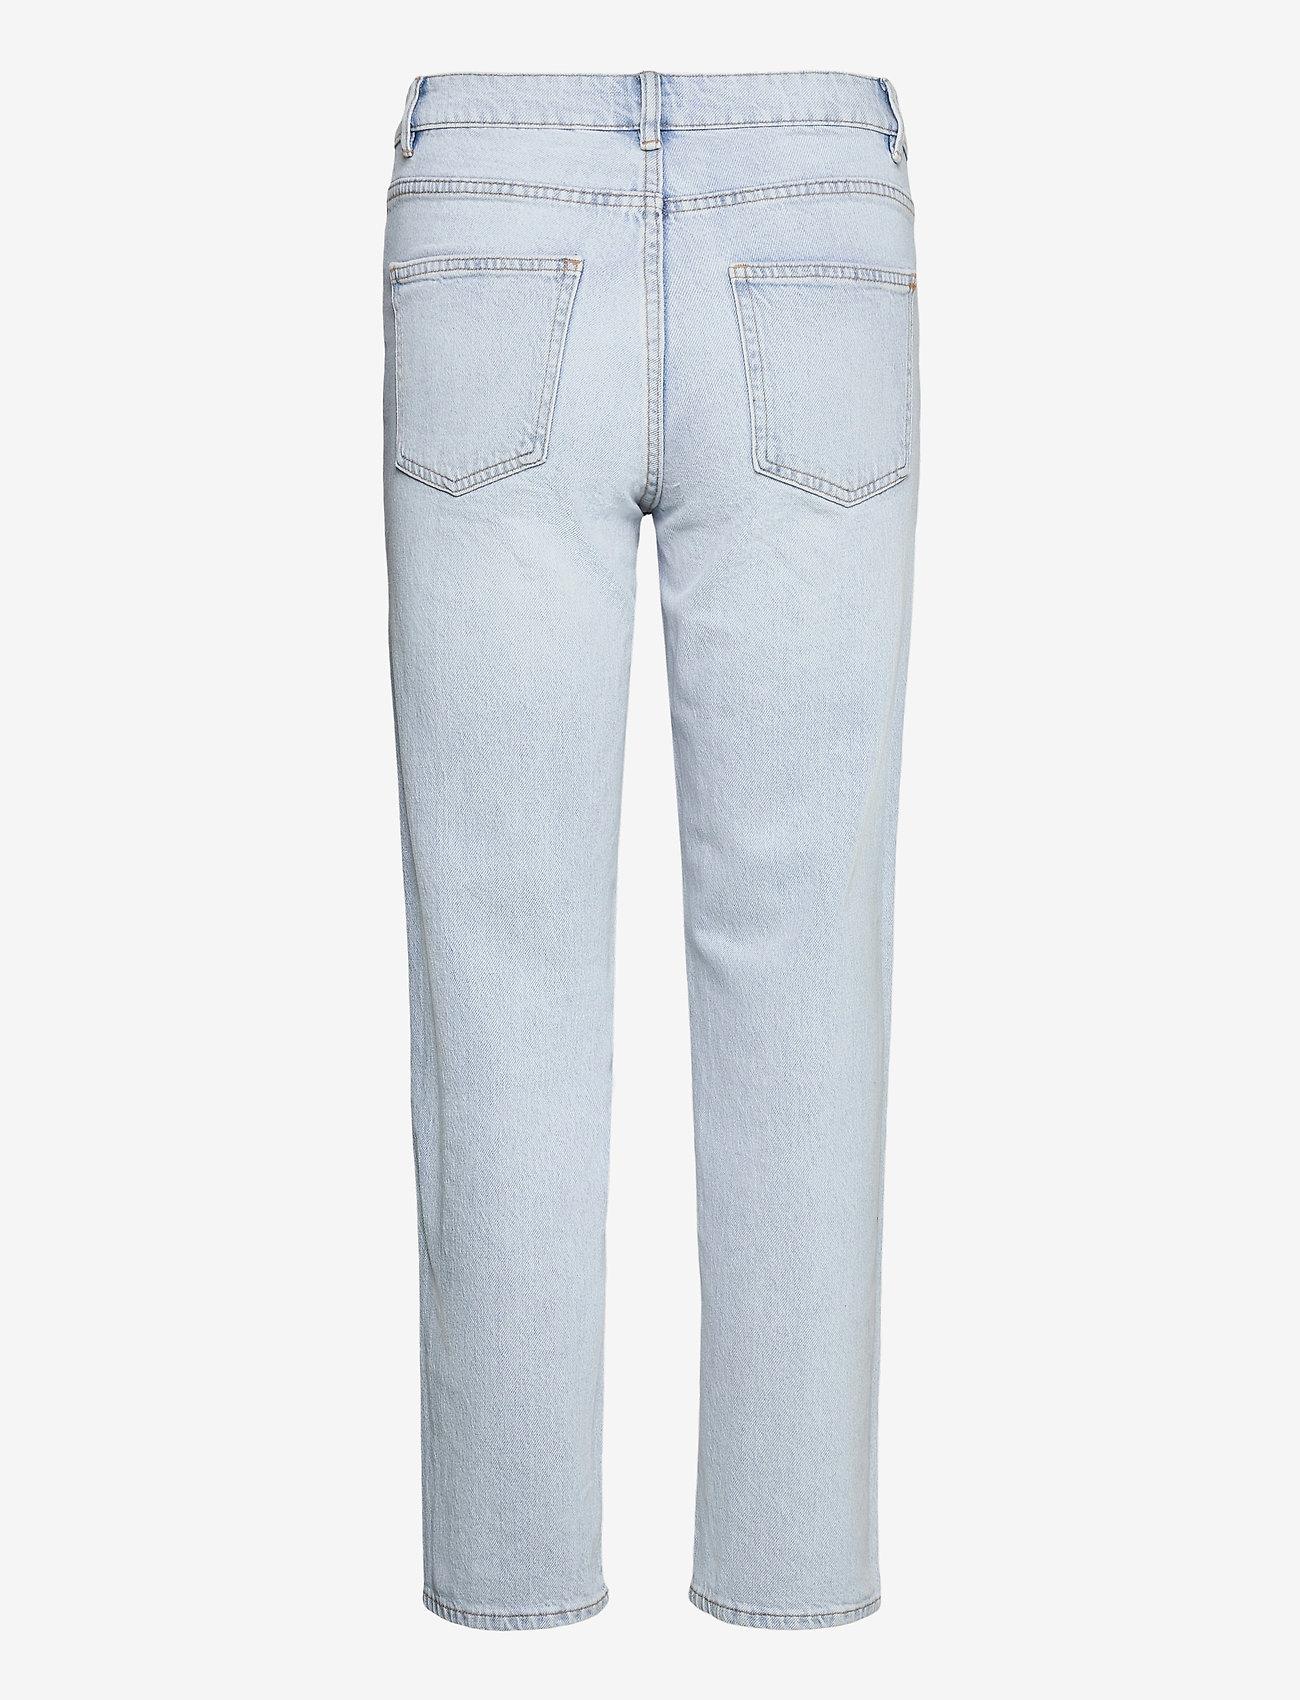 Lindex - Denim trousers Nea light blue - straight regular - blue - 1